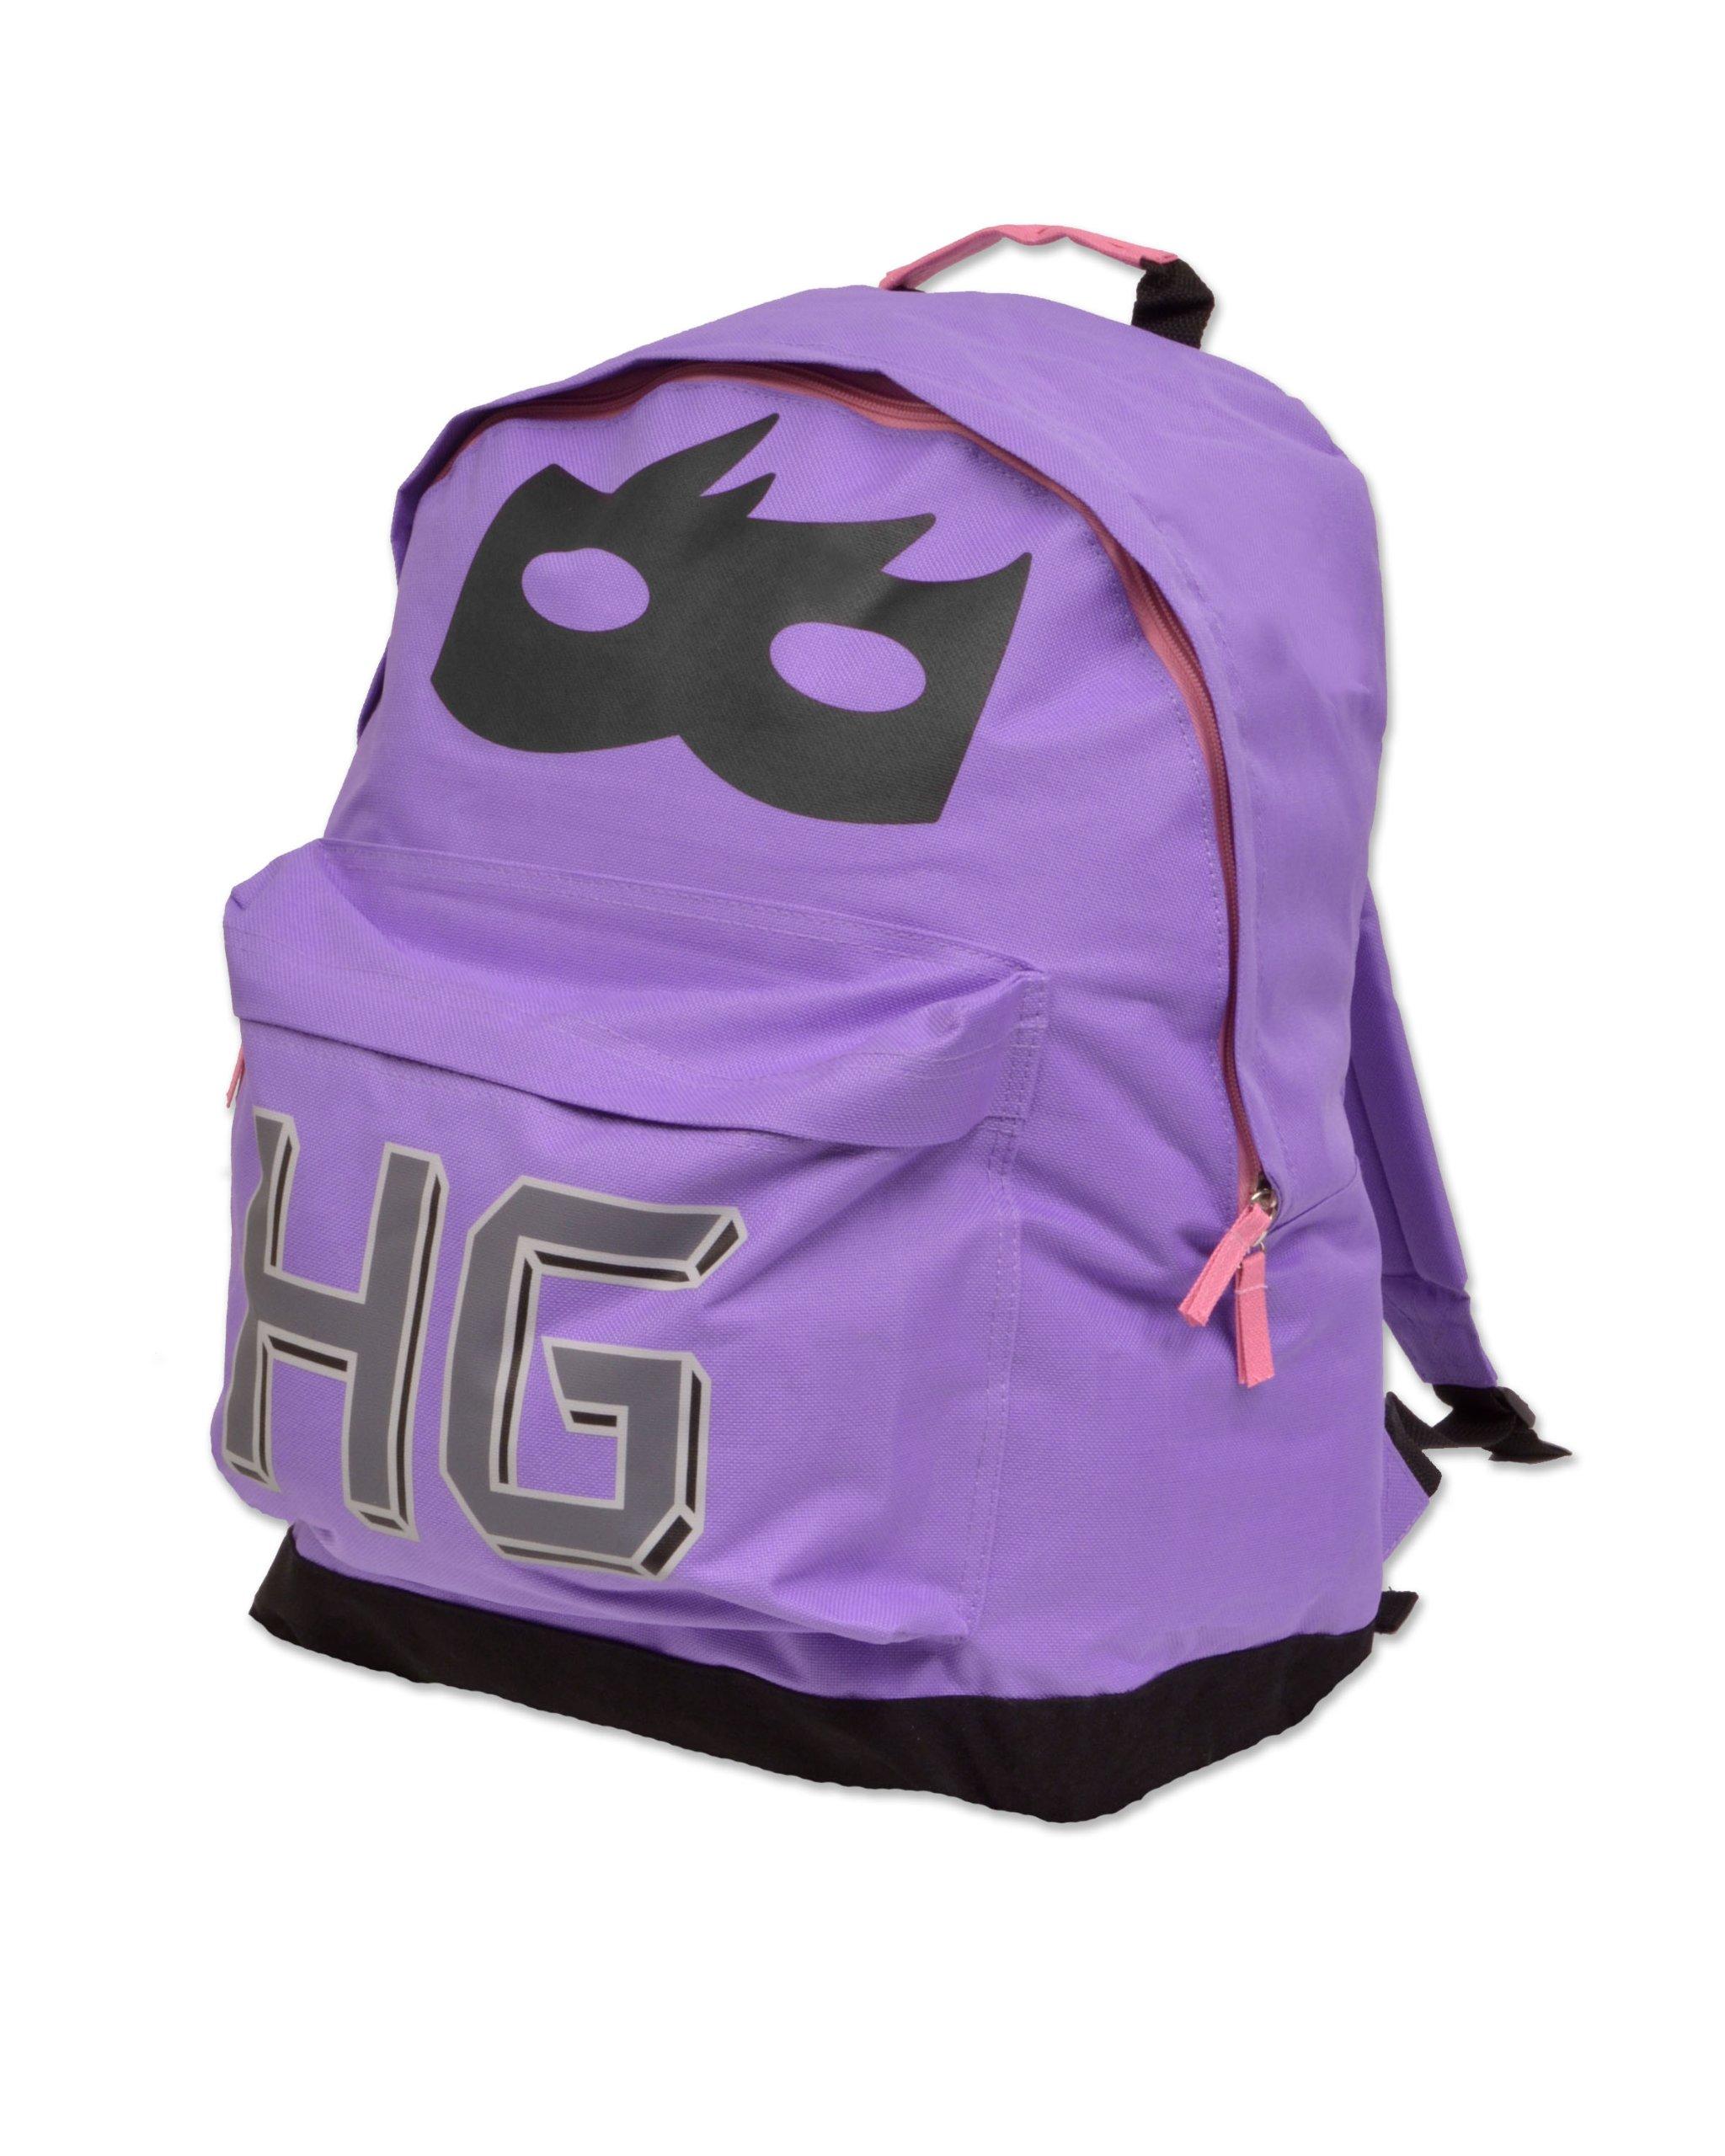 Kick Ass 2 ''Hit Girl Mask'' Backpack Double Buckle